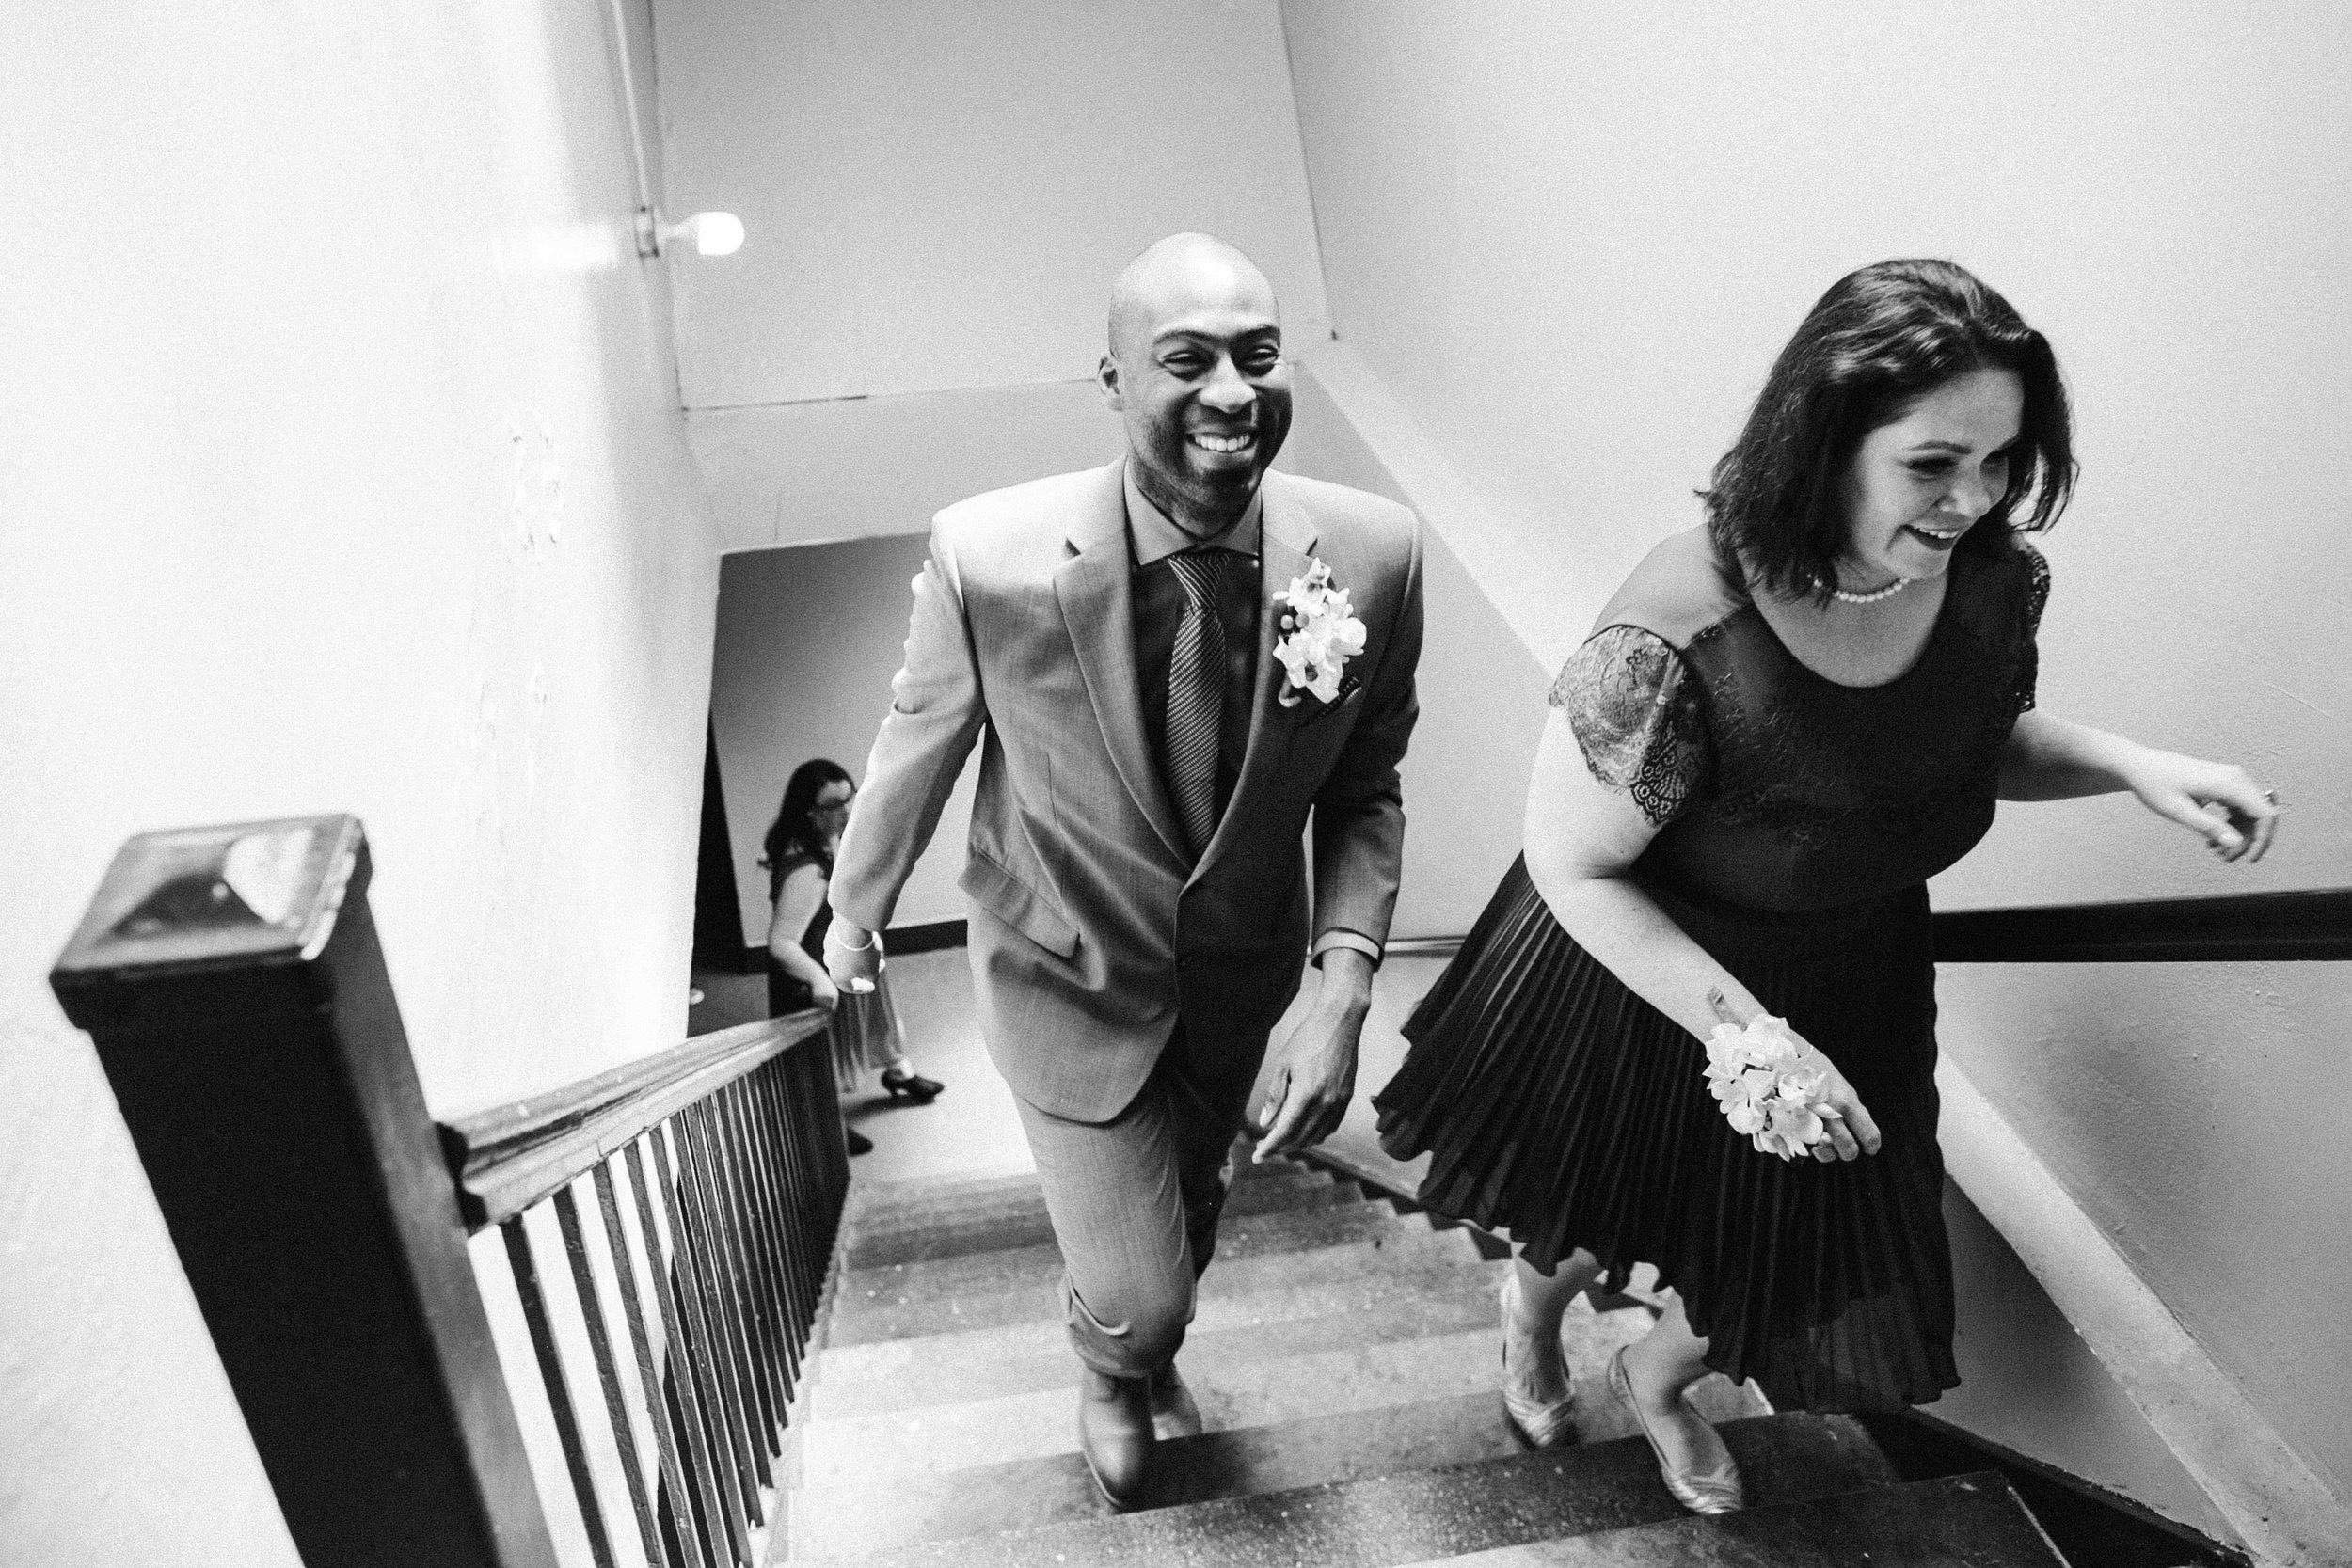 Sevlynn-Photography-Wedding-LIC-Landing-Maiella-NYC-17.jpg